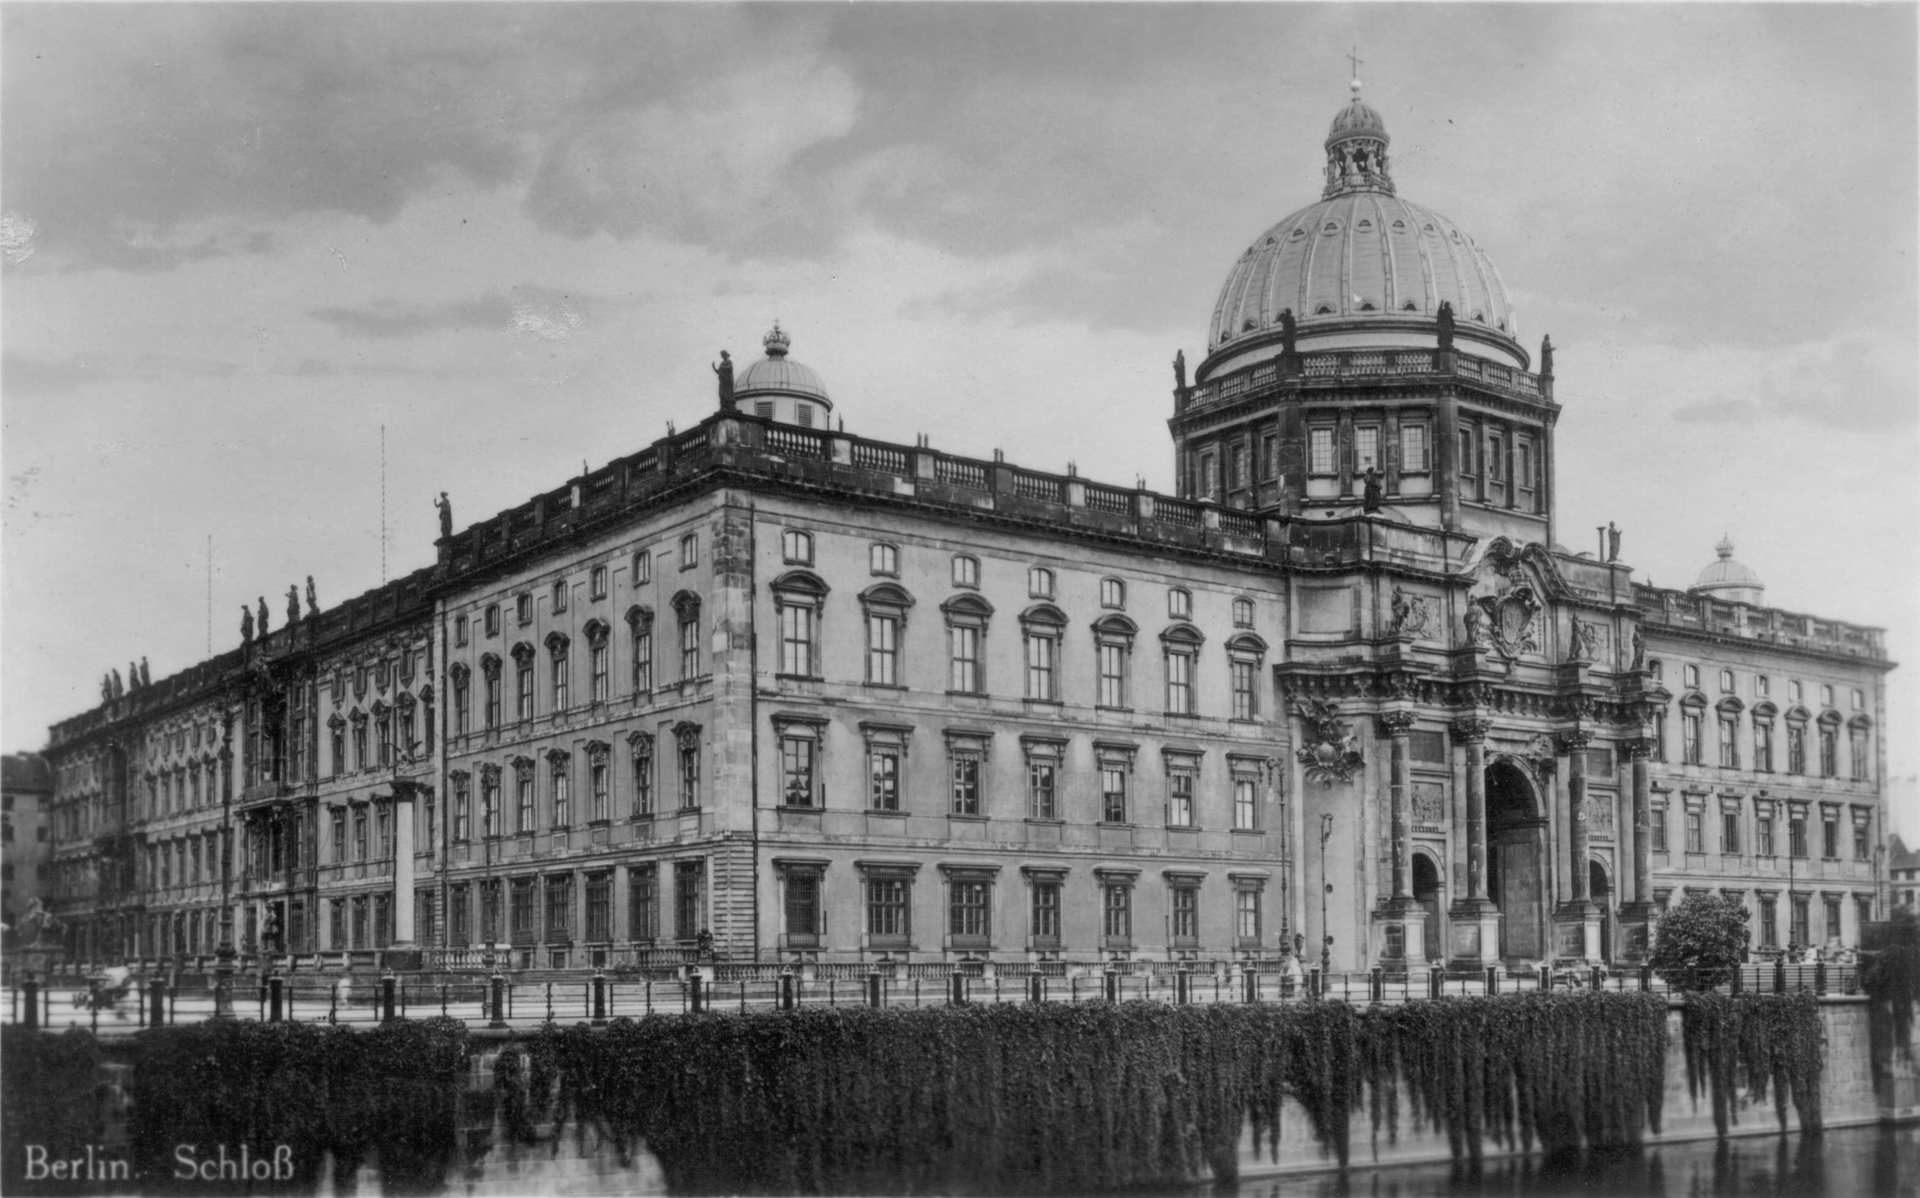 Berliner-Stadtschloss-postcard-from-the-1920s.jpg